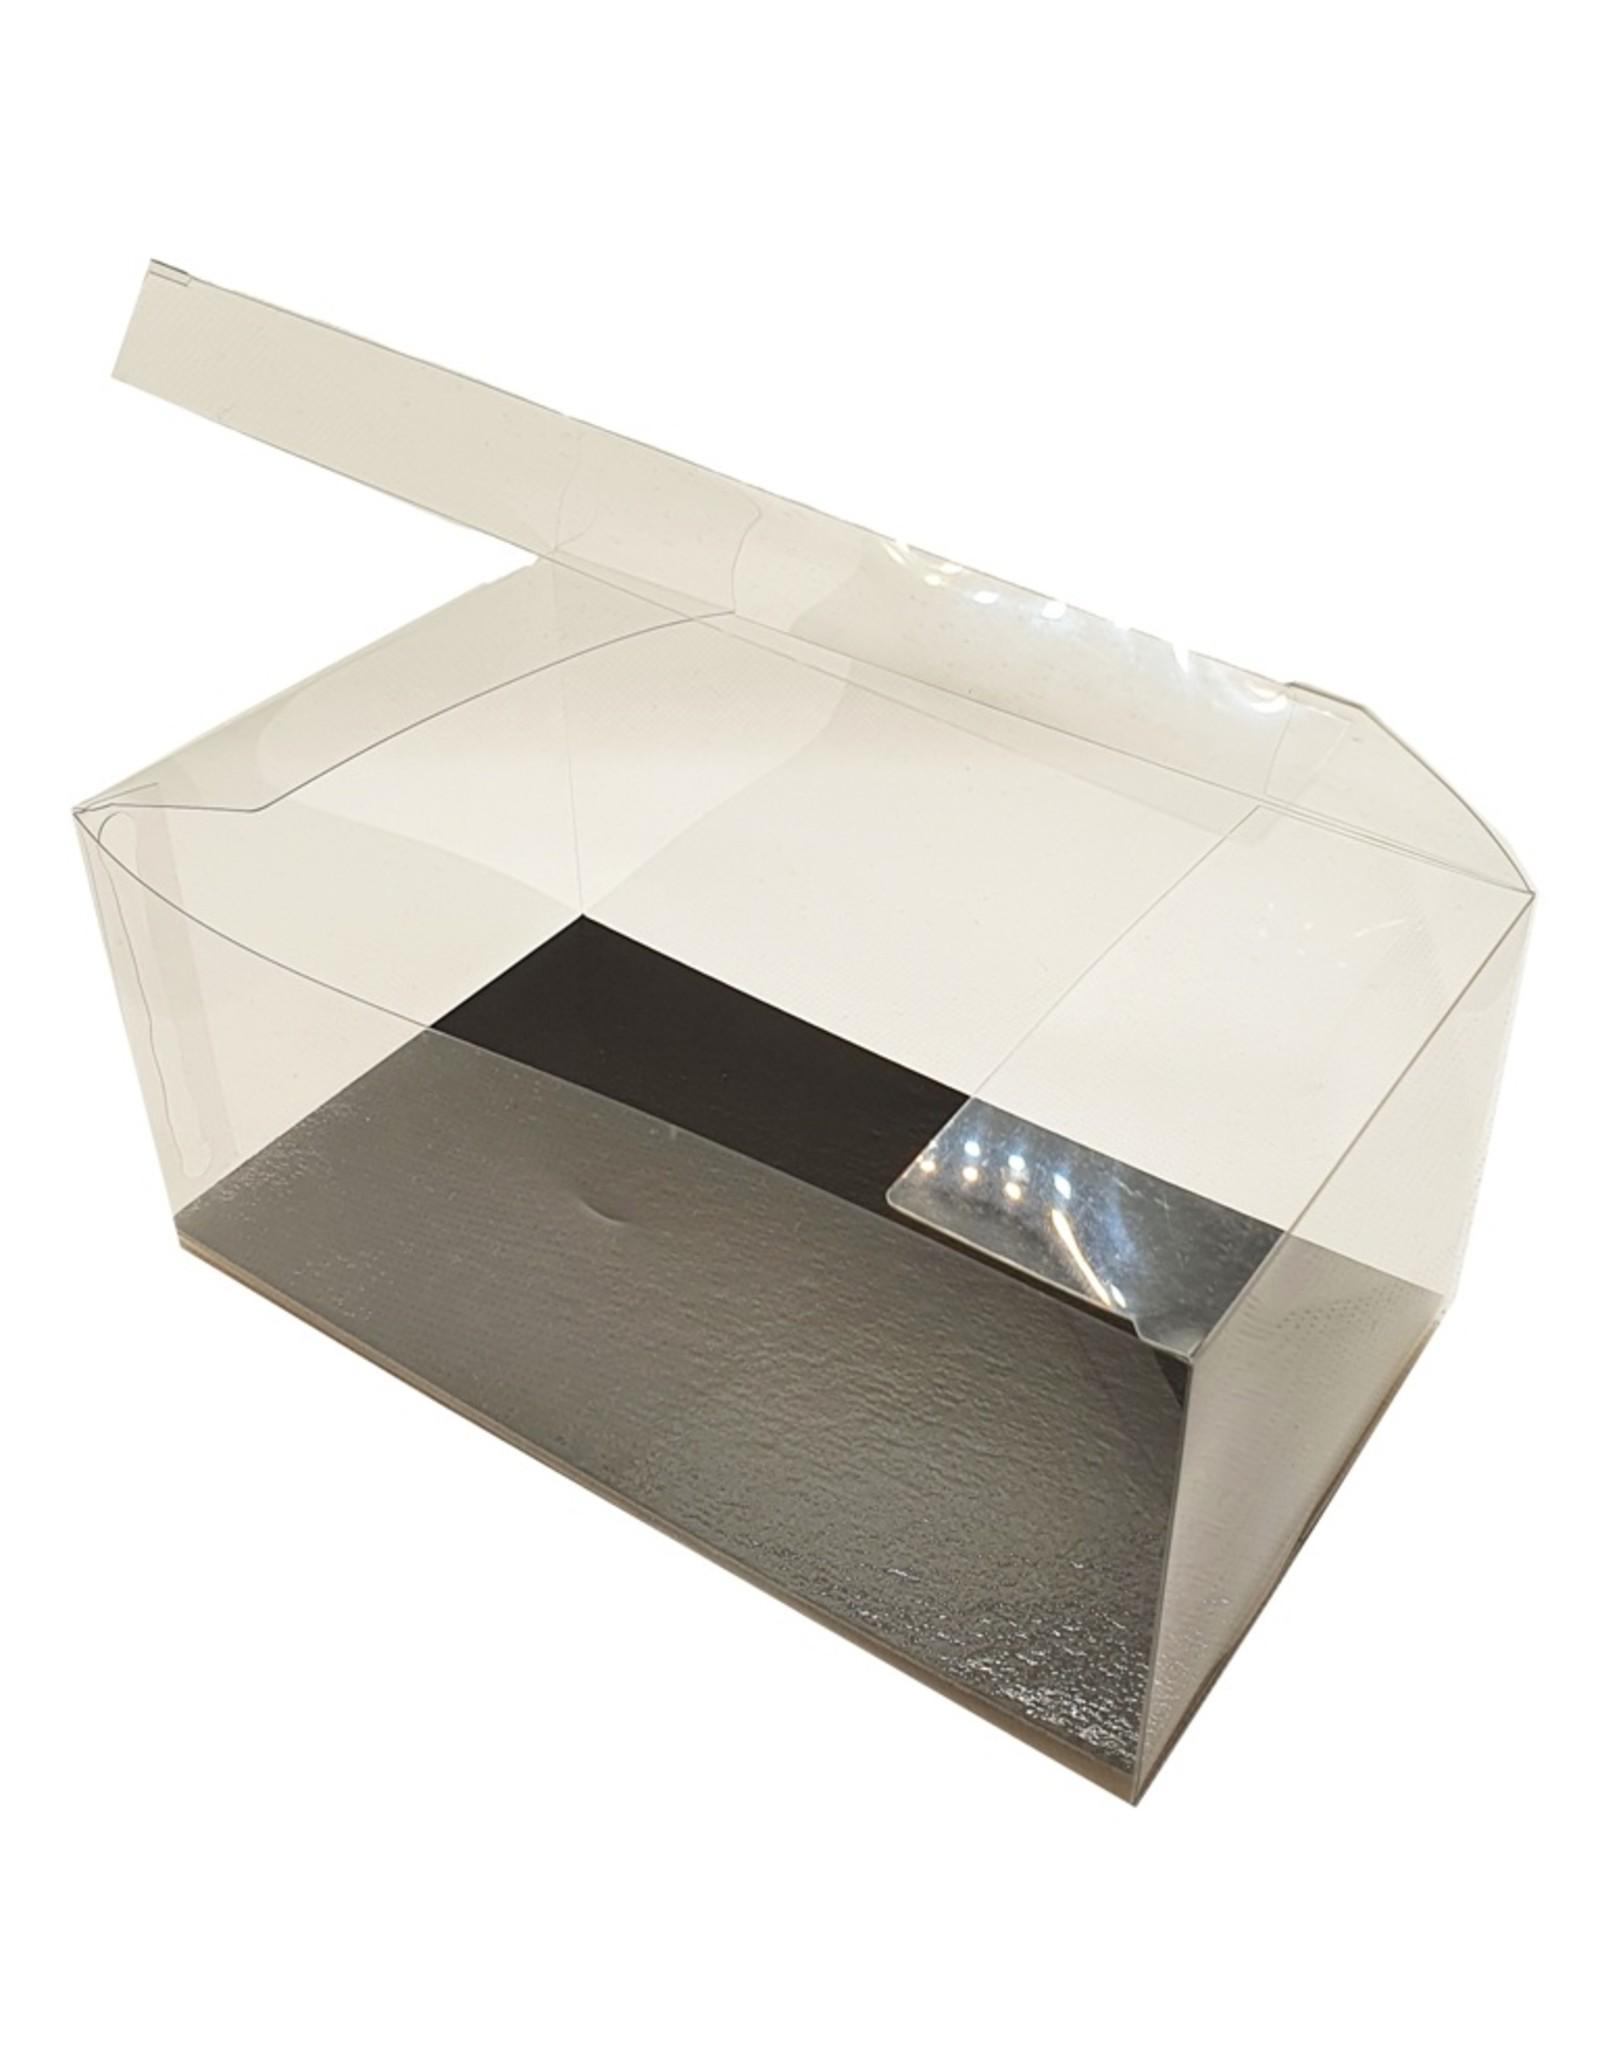 Transparante sweets box - 17,5 x 10 x 8 cm  (per 100 stuks)